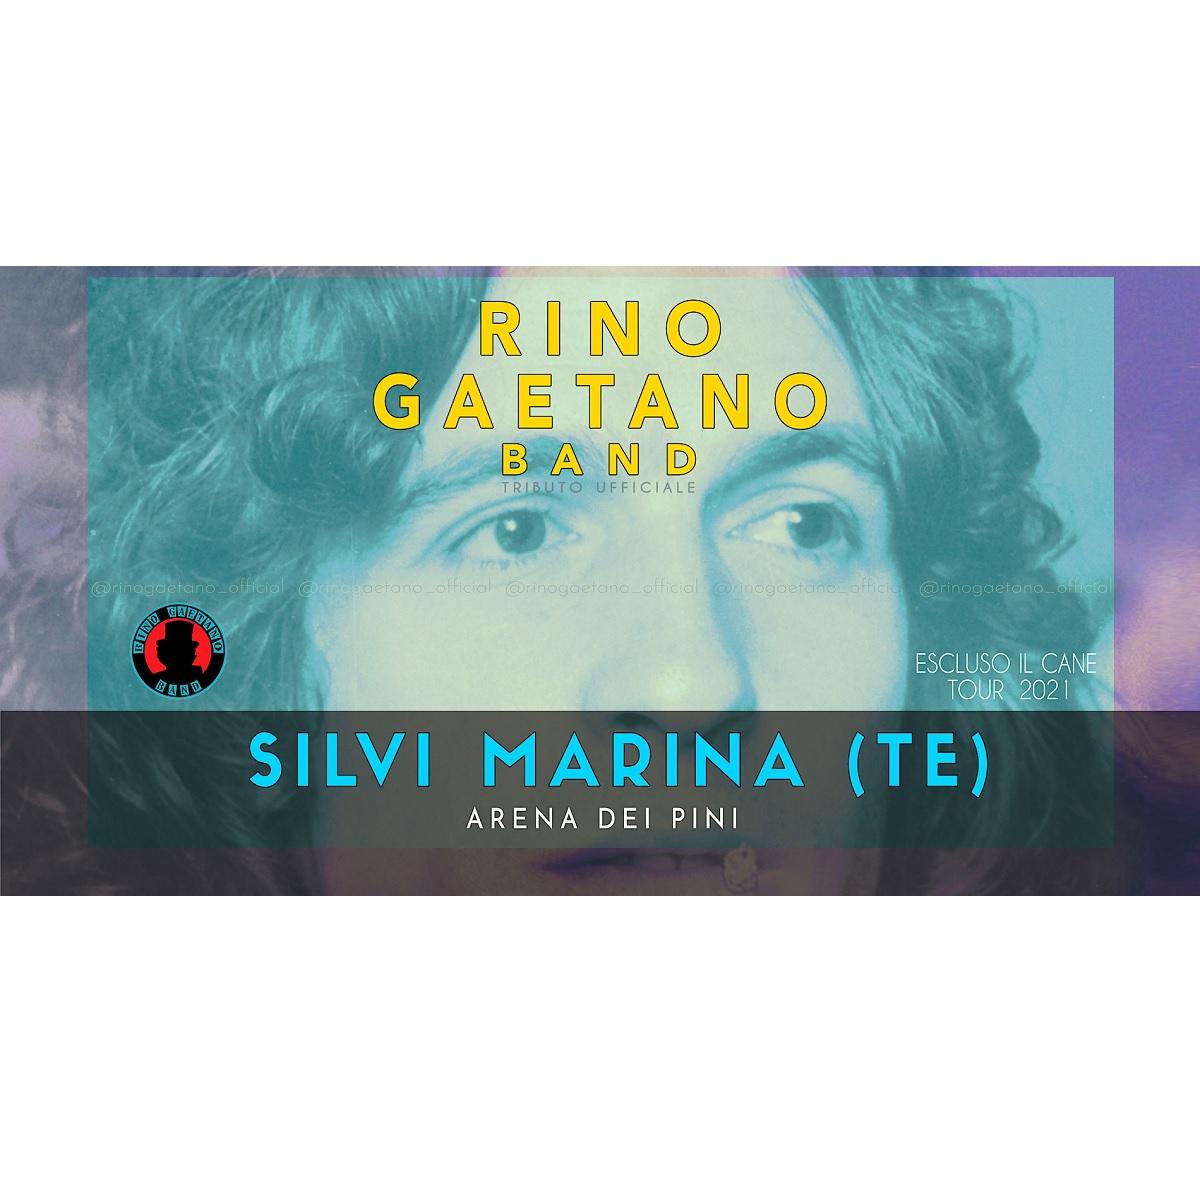 Rino Gaetano Band a Silvi Marina 31 luglio 2021 foto